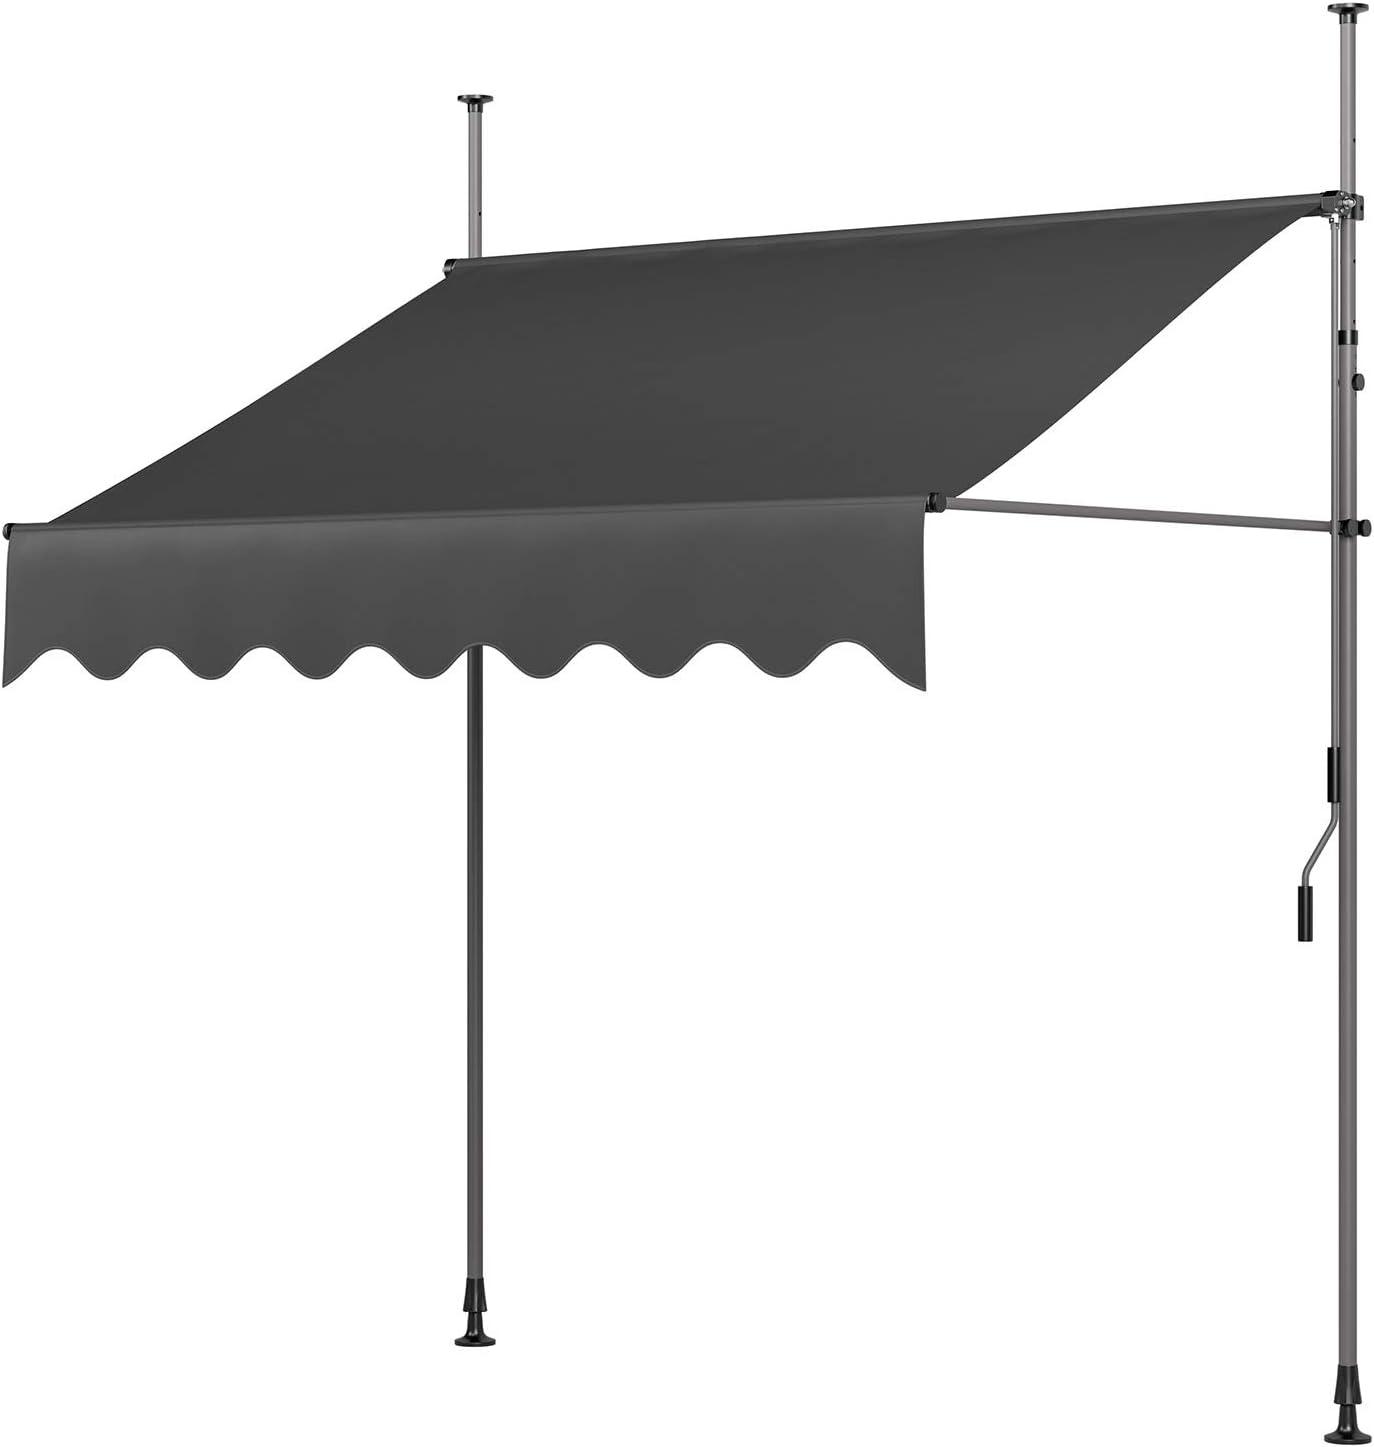 MVPower Toldo Articulado con Armazón, Terraza Balcón Toldo Extensible, Resistente a Los Rayos UV, 300 x 120 cm, Gris: Amazon.es: Jardín